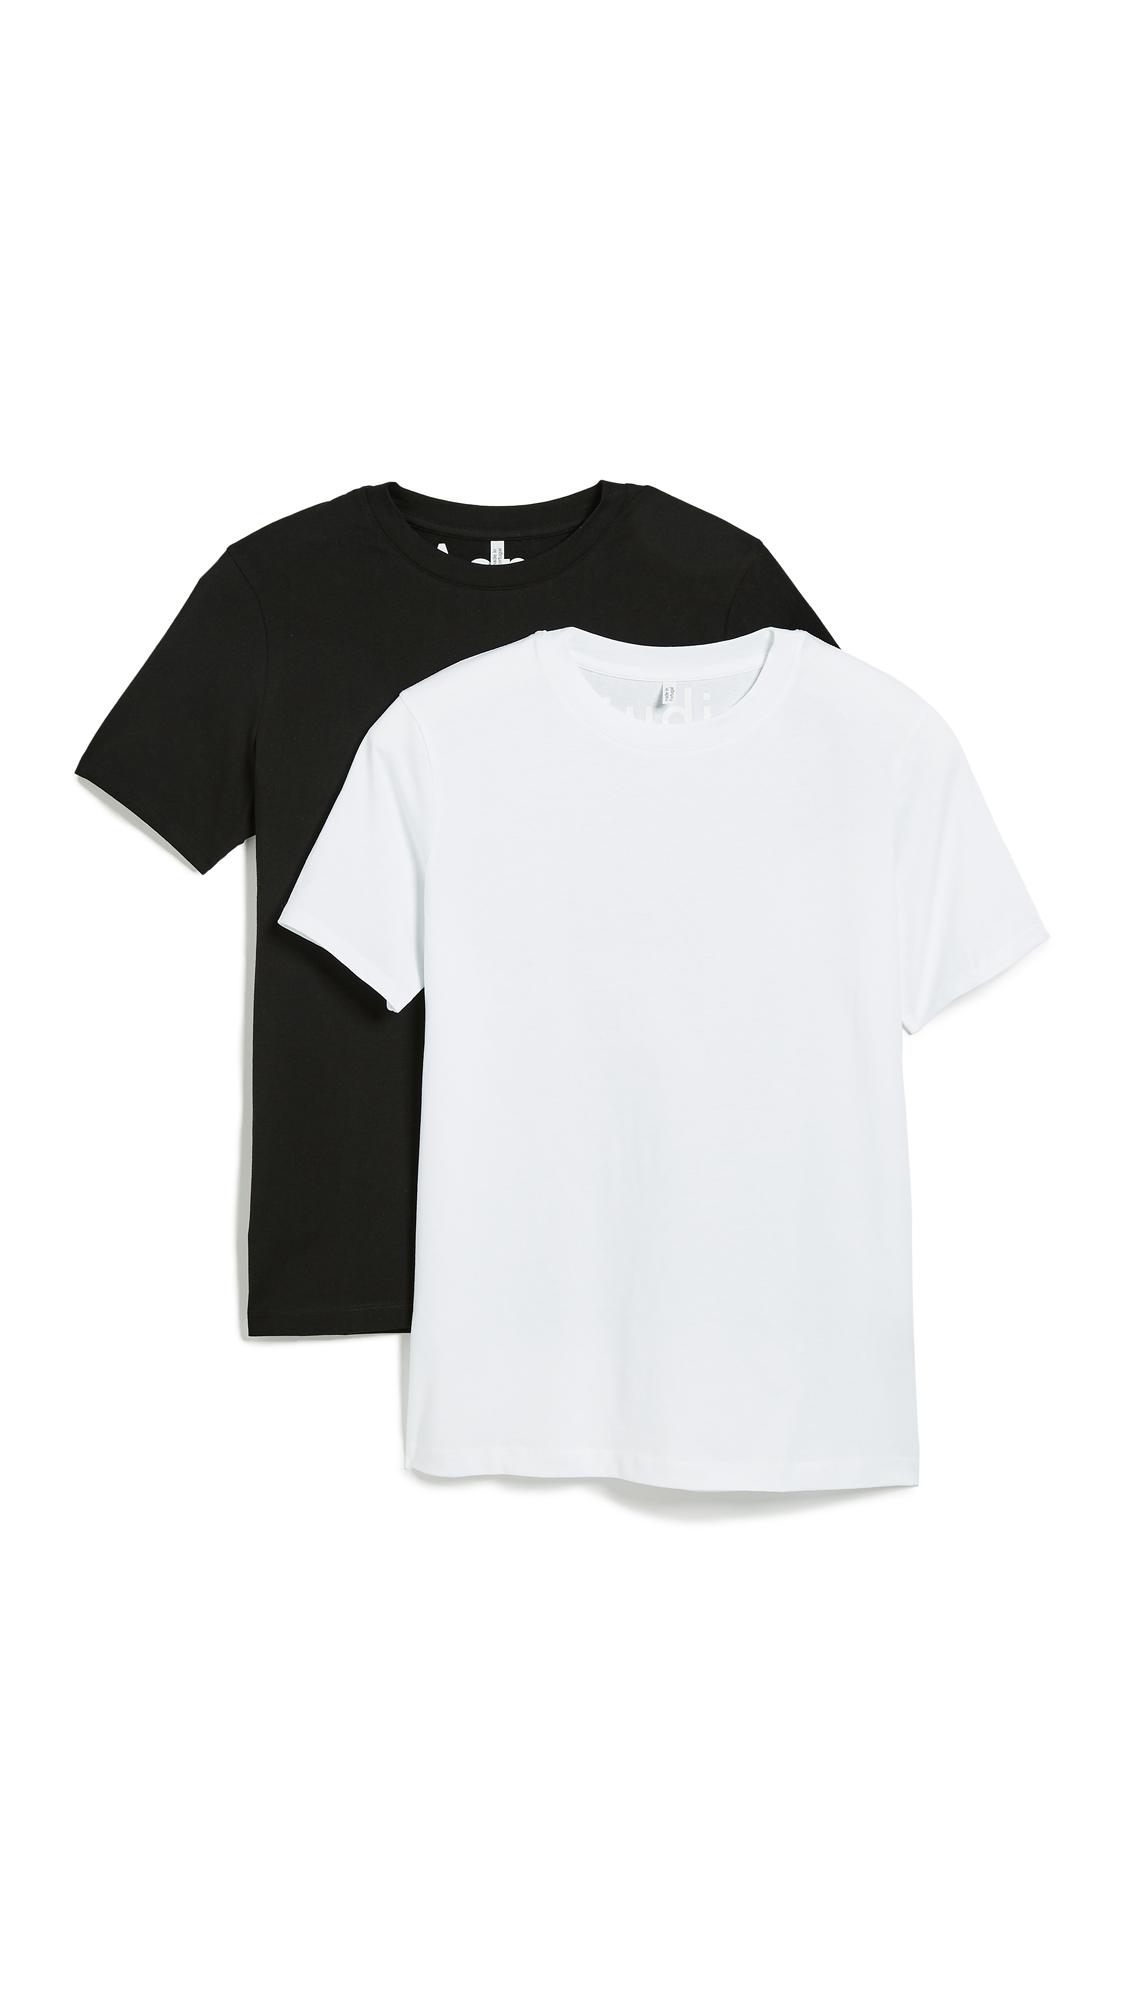 Acne Studios Taline Tee 2 Pack - Optic White/Black